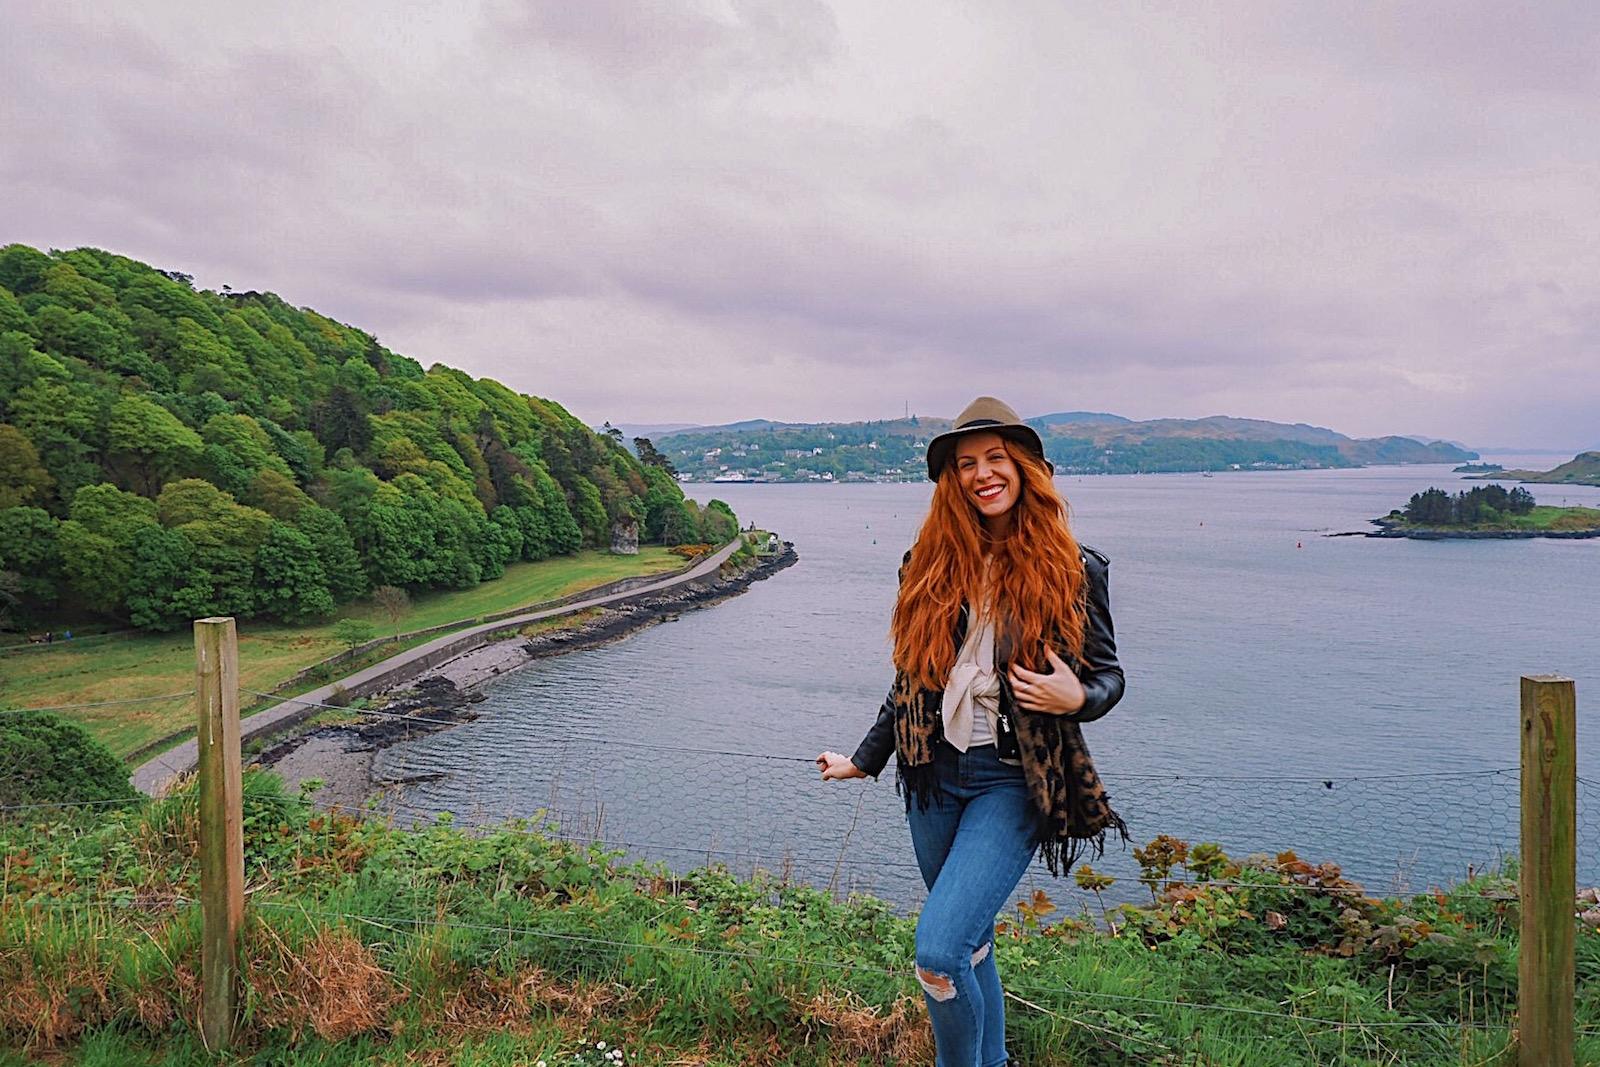 redhead-round-the-world-scotland-blogger-travel-oban-castle-views.JPG